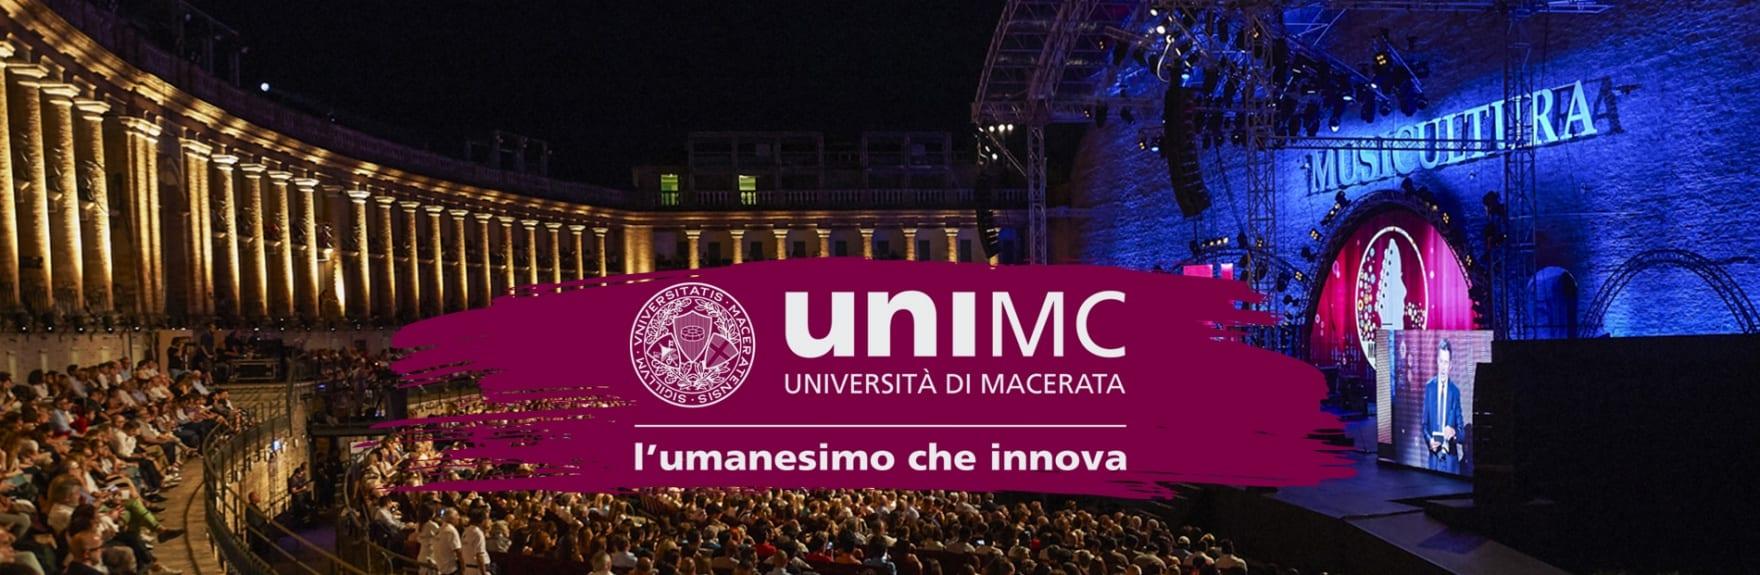 Musicultura_universita_2019-1760x575